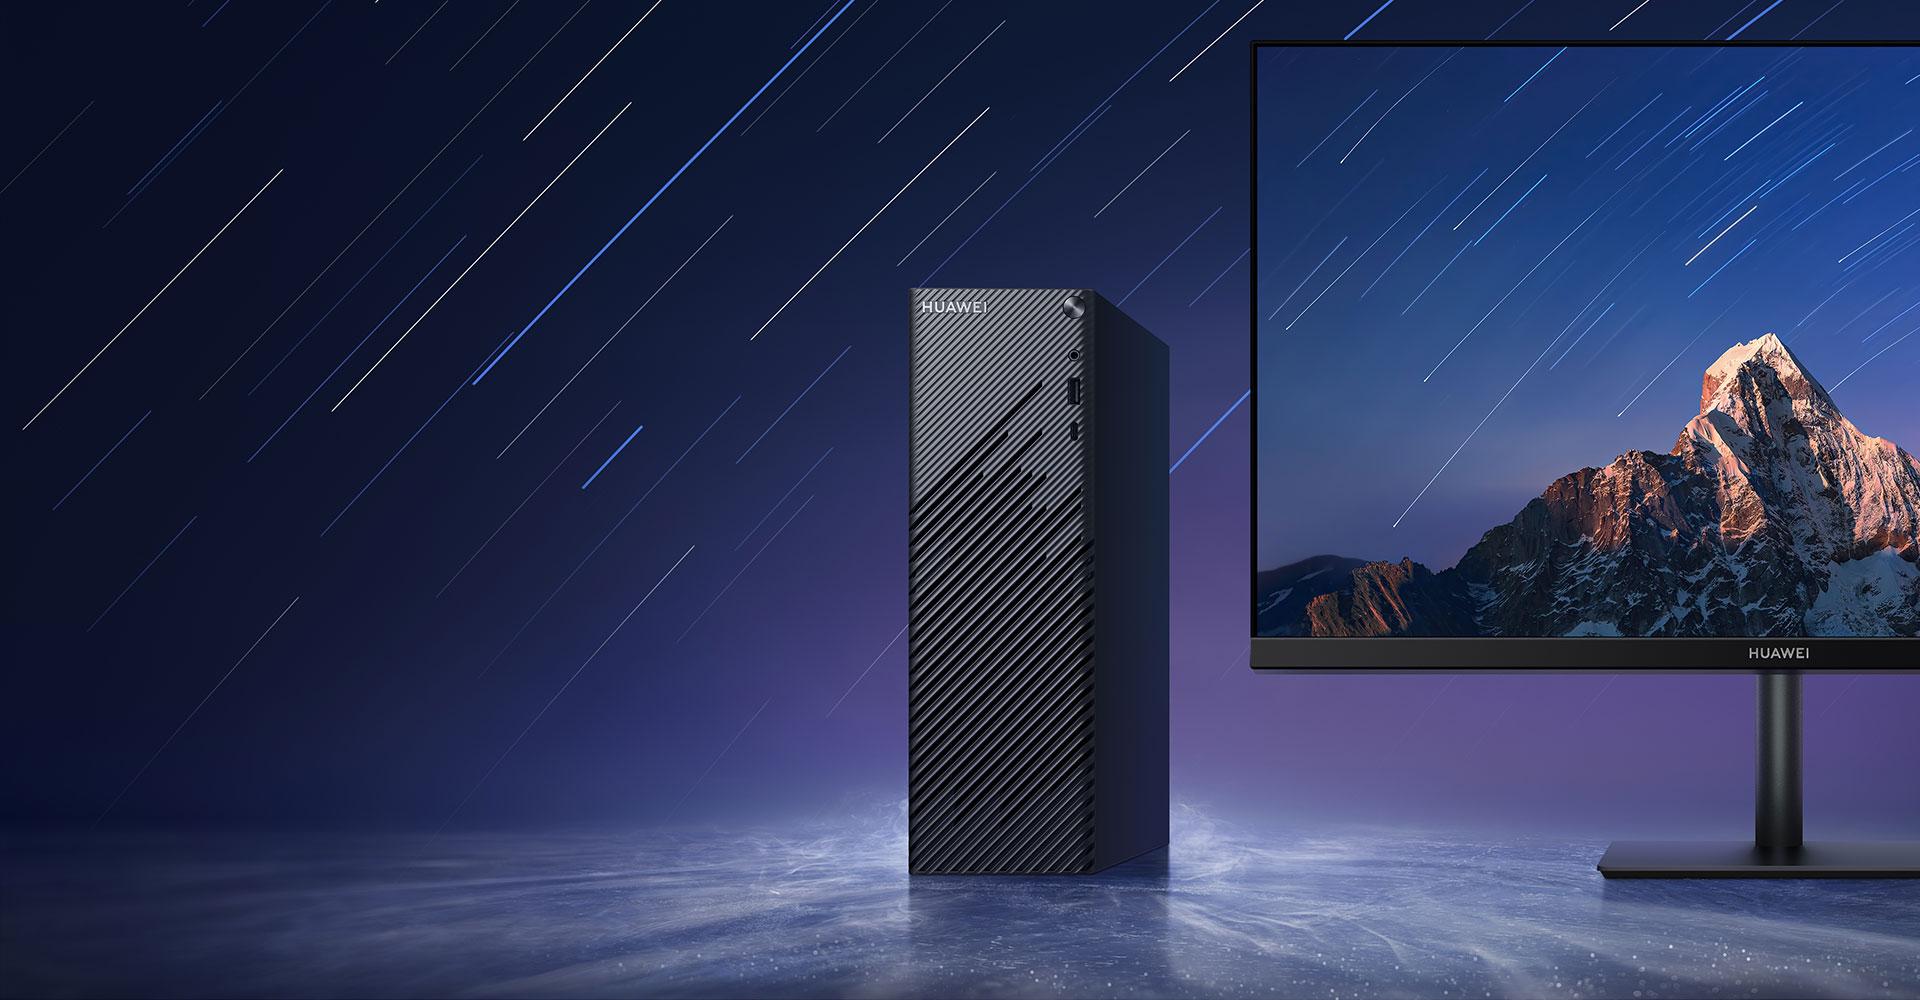 Huawei MateStation S + Elegante diseño de estela de estrellas